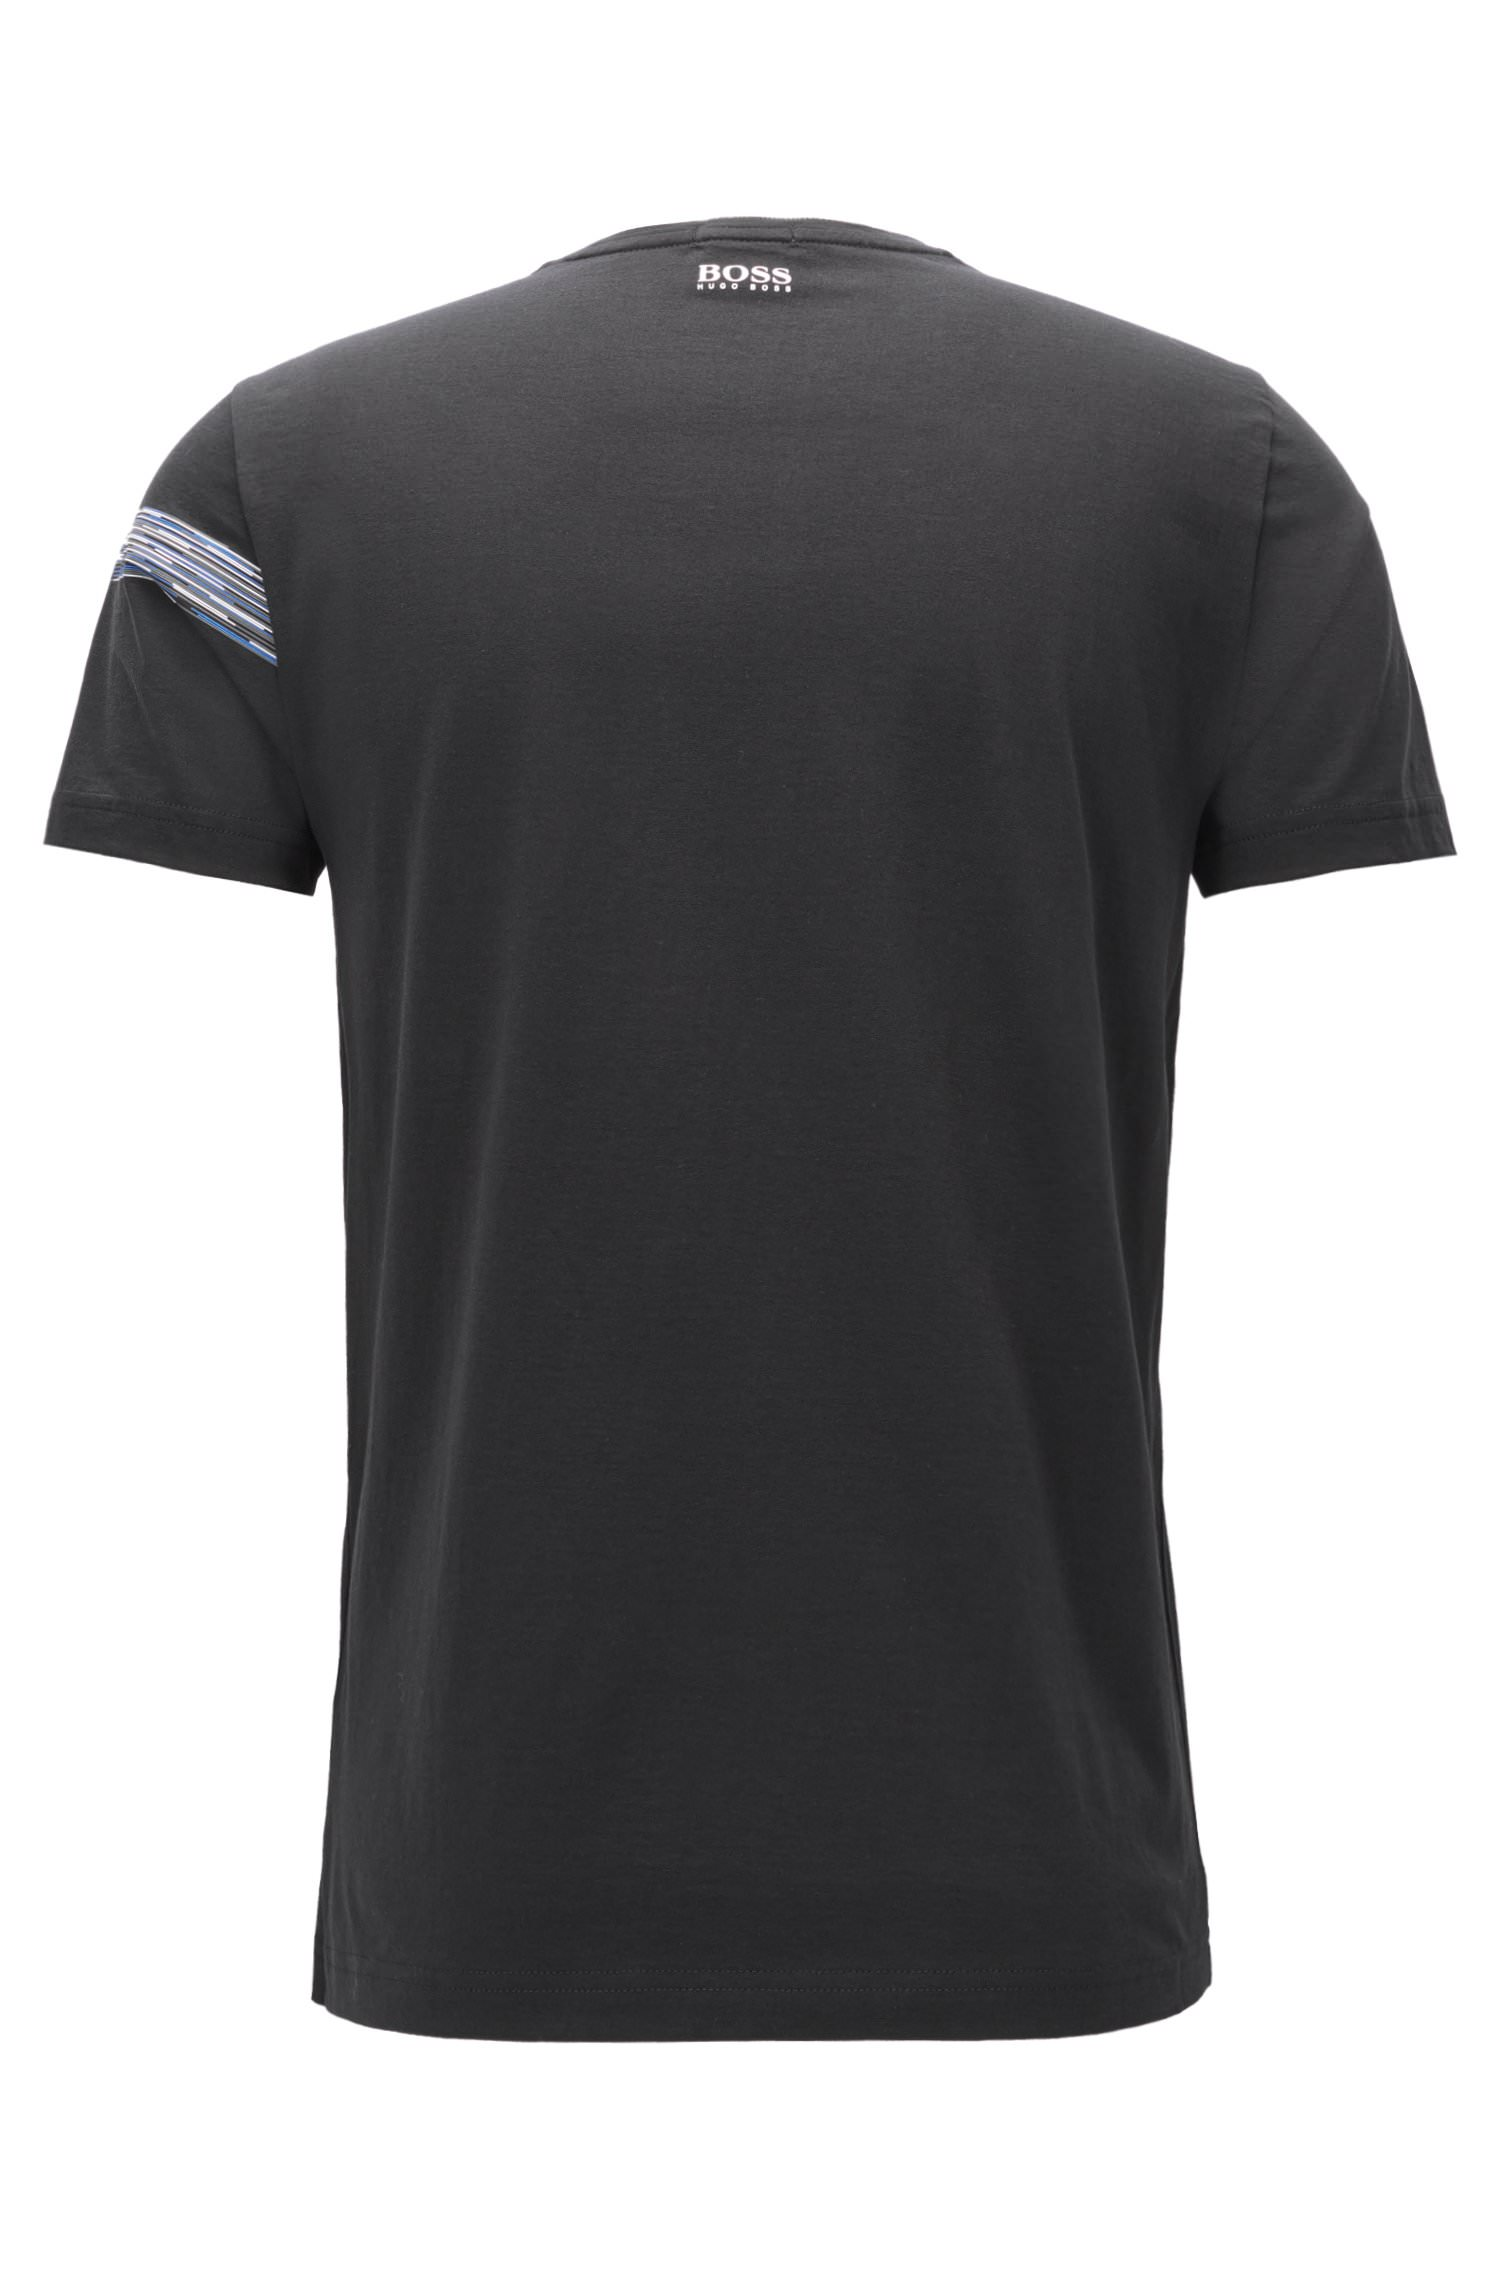 Hugo Boss Green Men/'s Graphic Premium Cotton Shirt T-shirt TEEP 1 50372545